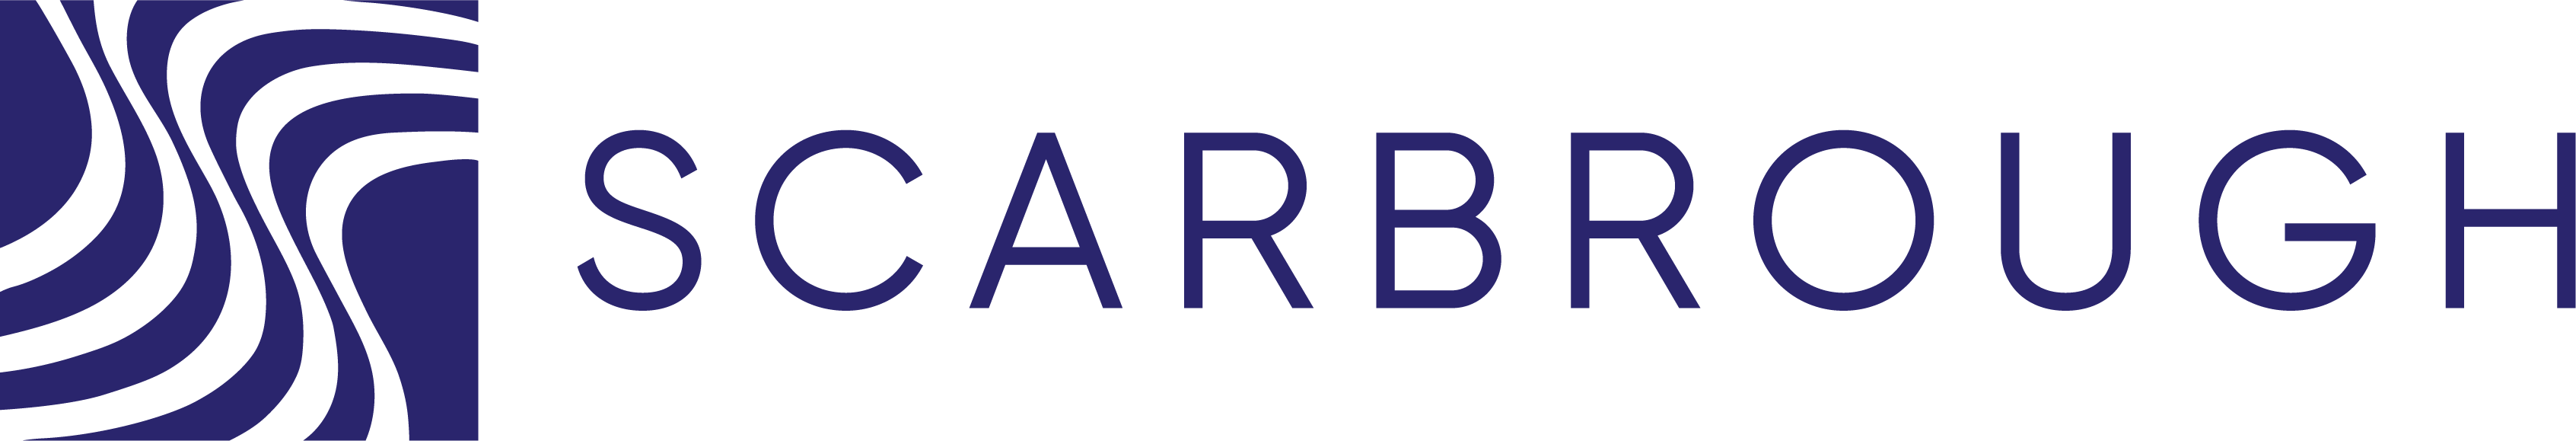 Scarbrough   new logo 2020